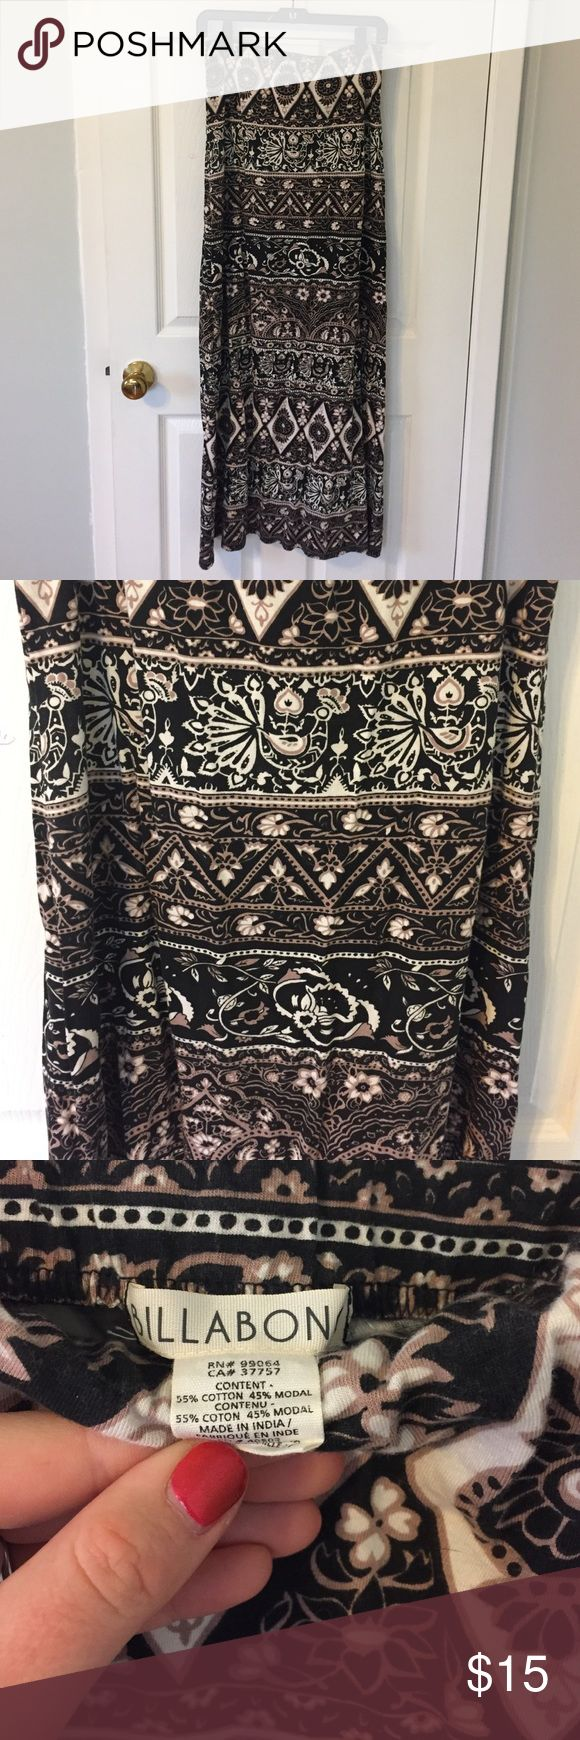 Billabong Tribal Maxi Skirt Size L Great condition. Maxi skirt with tribal pattern. Size Large. Elastic waist band. Billabong Skirts Maxi